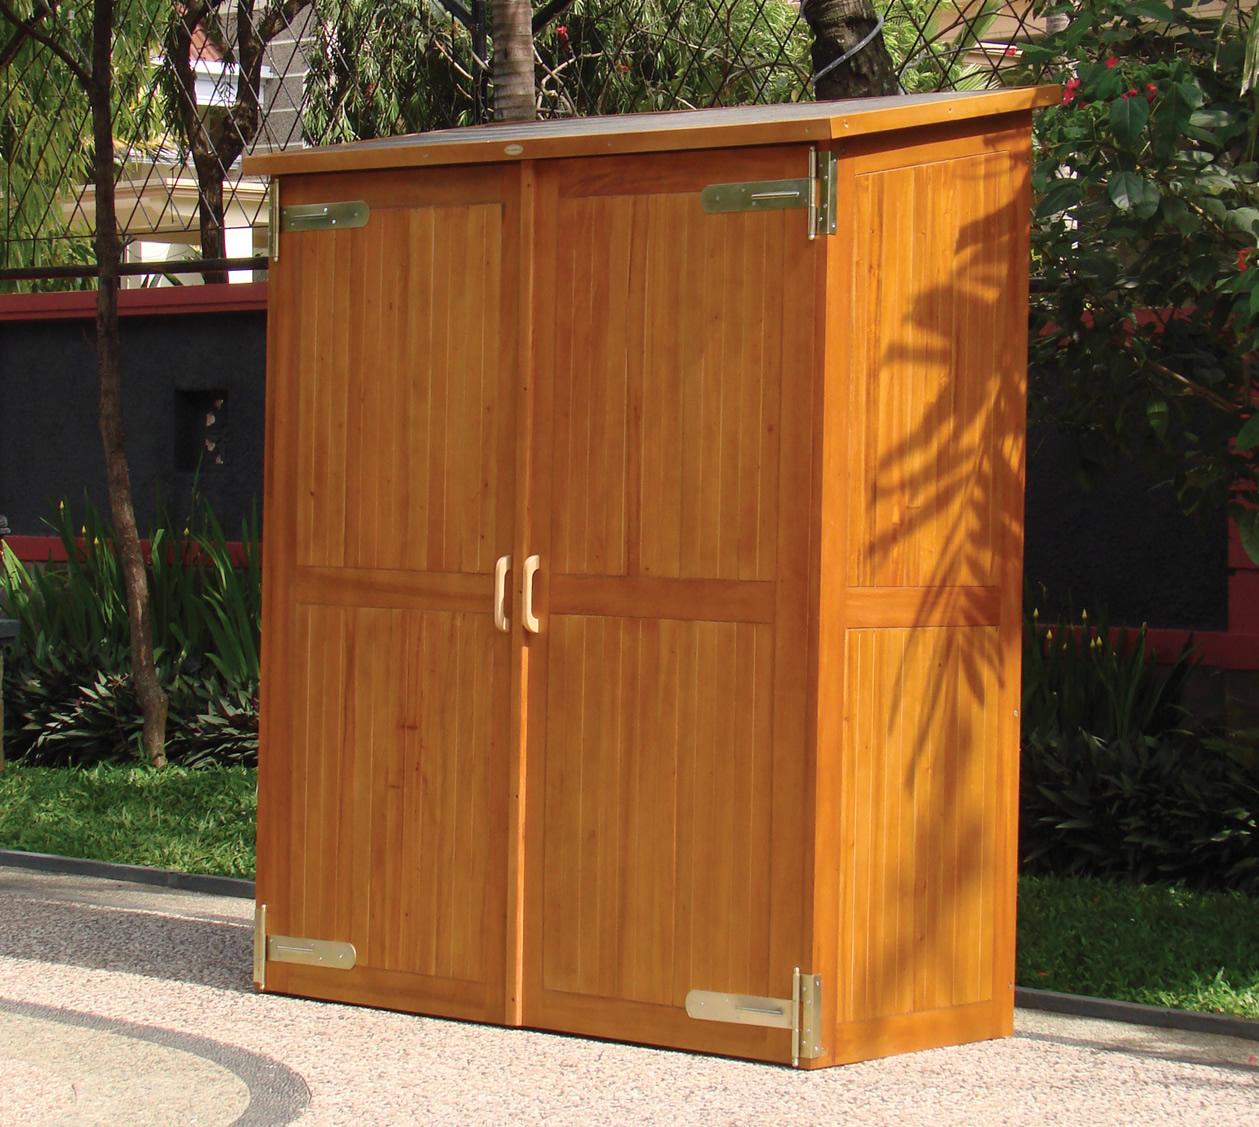 garden storage magnificent outdoor storage waterproof garden cabinet.jpg outdoor full  version ... YGLSFES